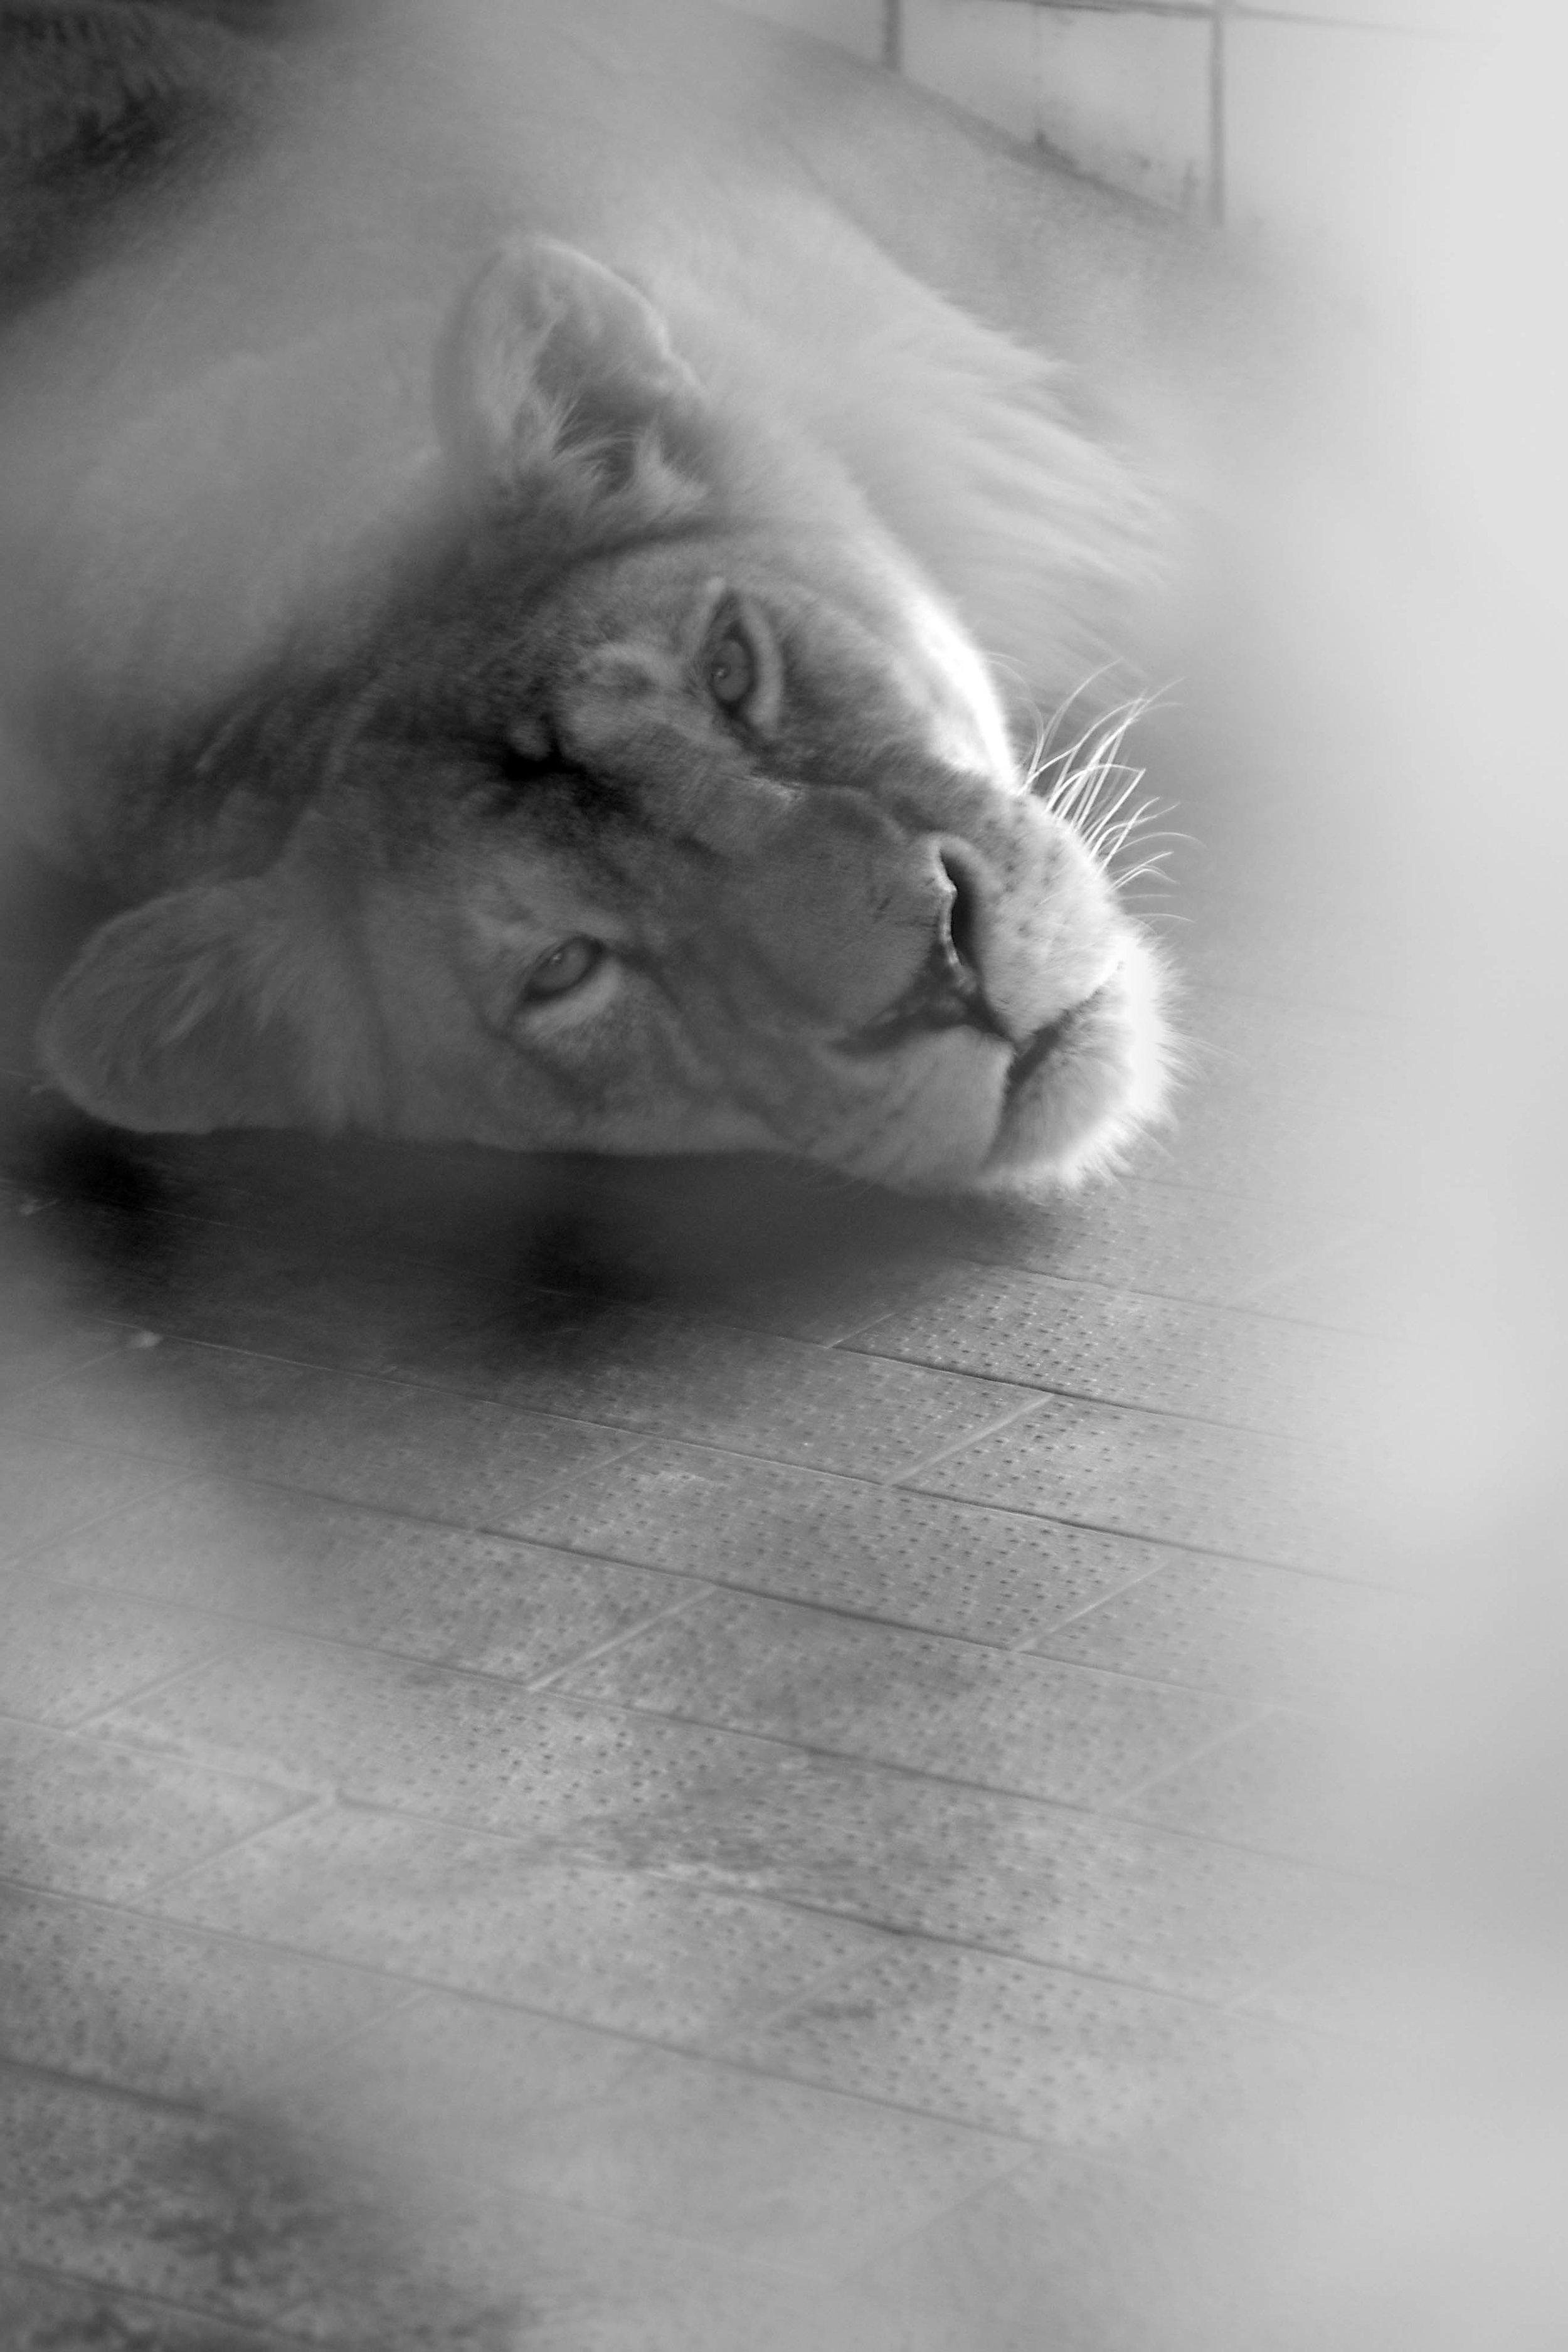 sad animals #2